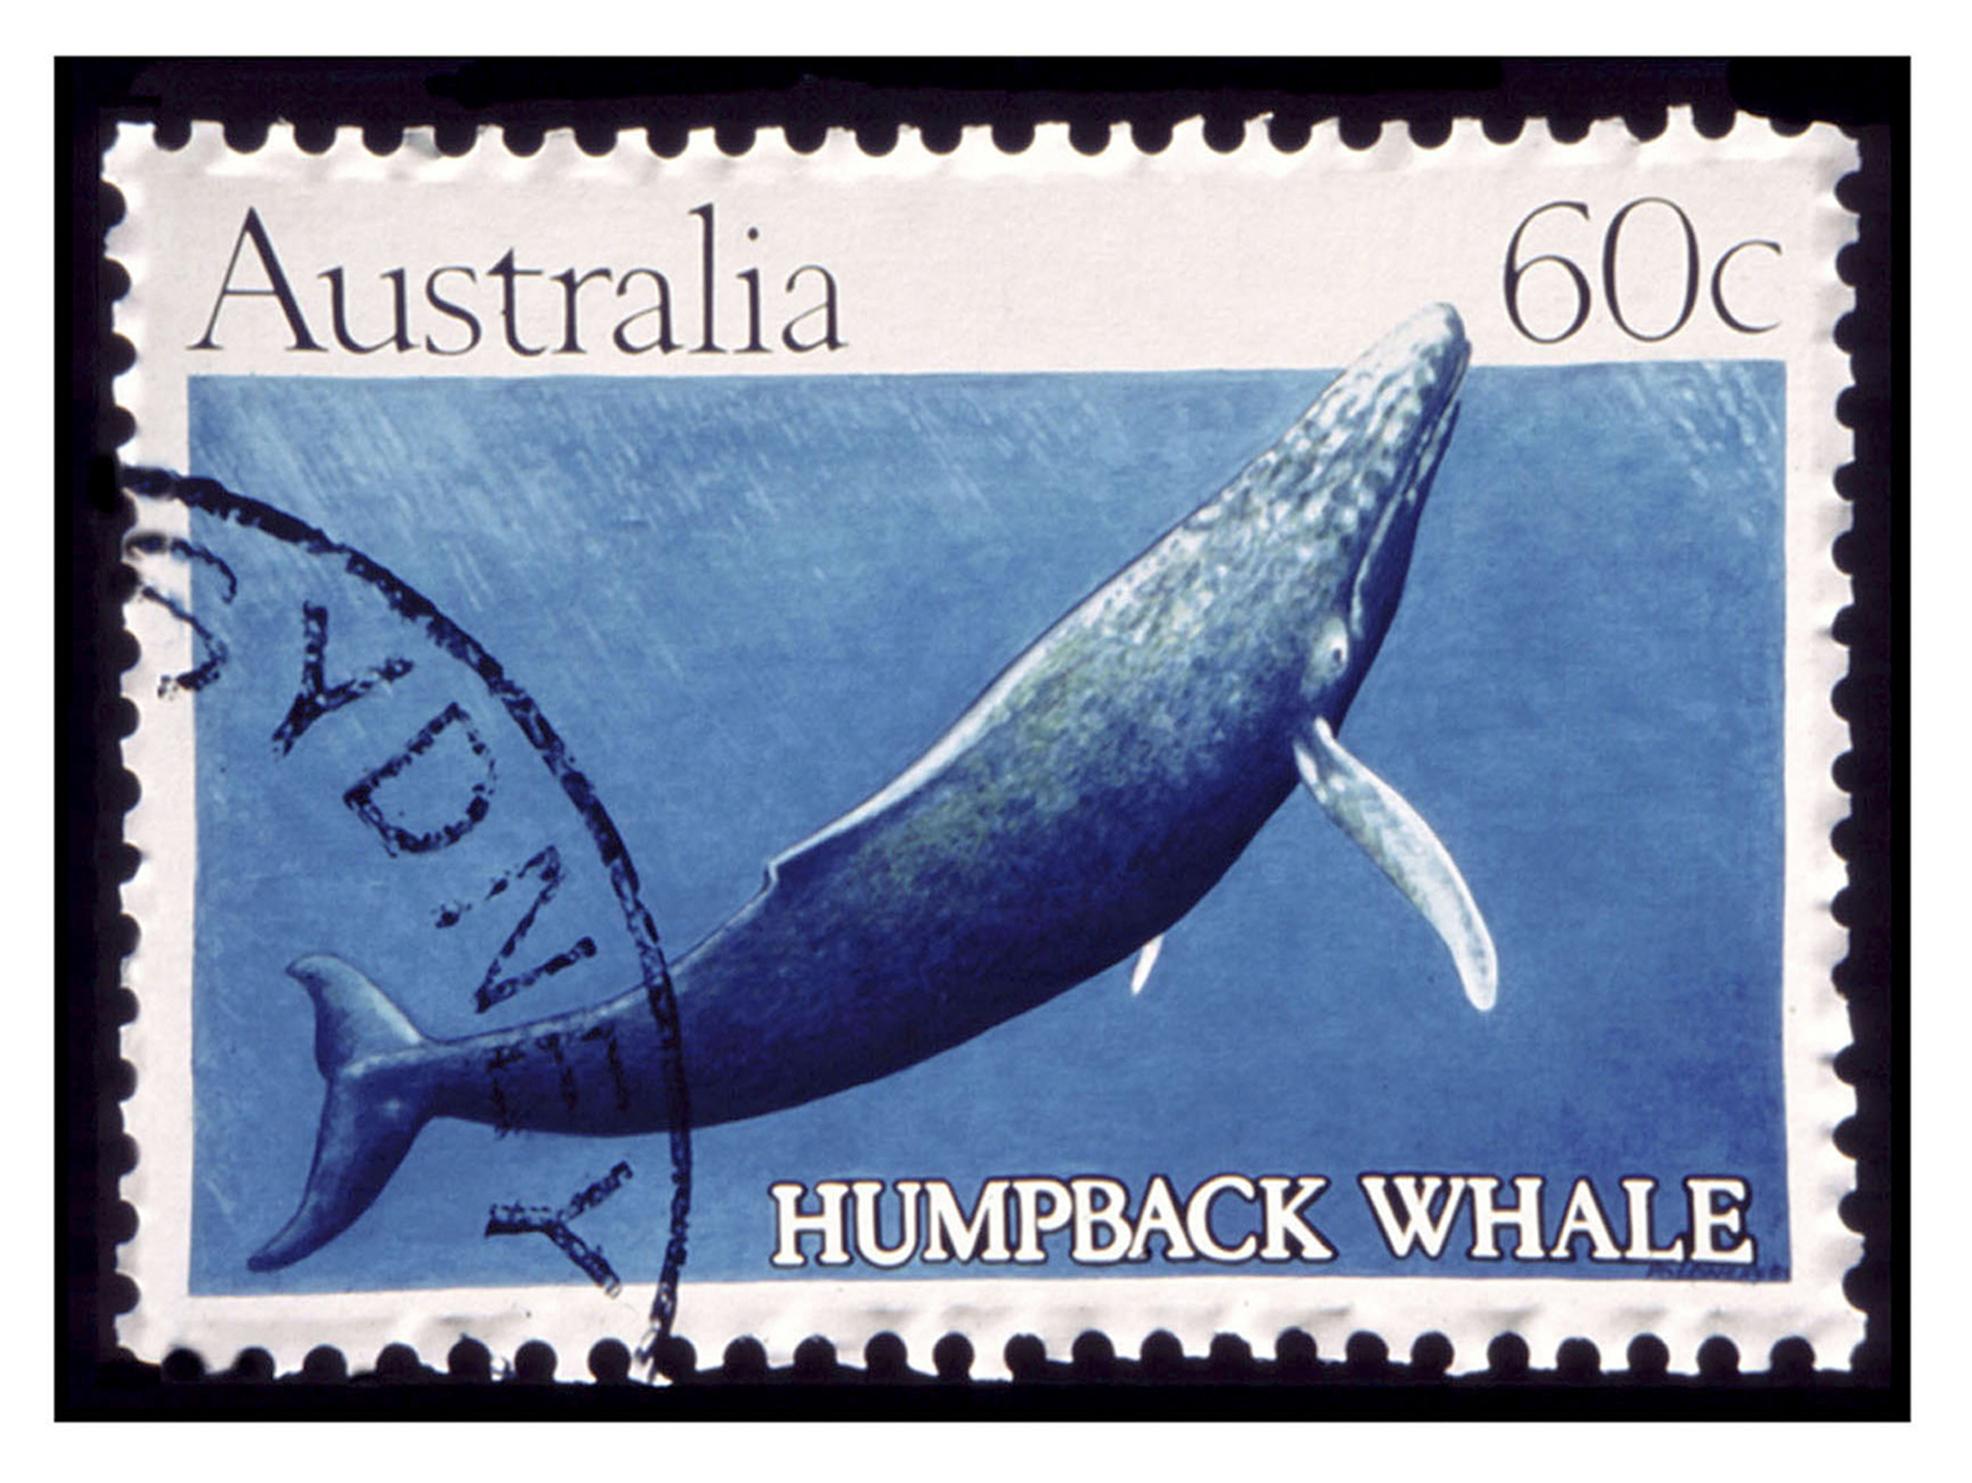 "Australia Humpback Whale, Acrylic on Canvas, 35"" x 48"""